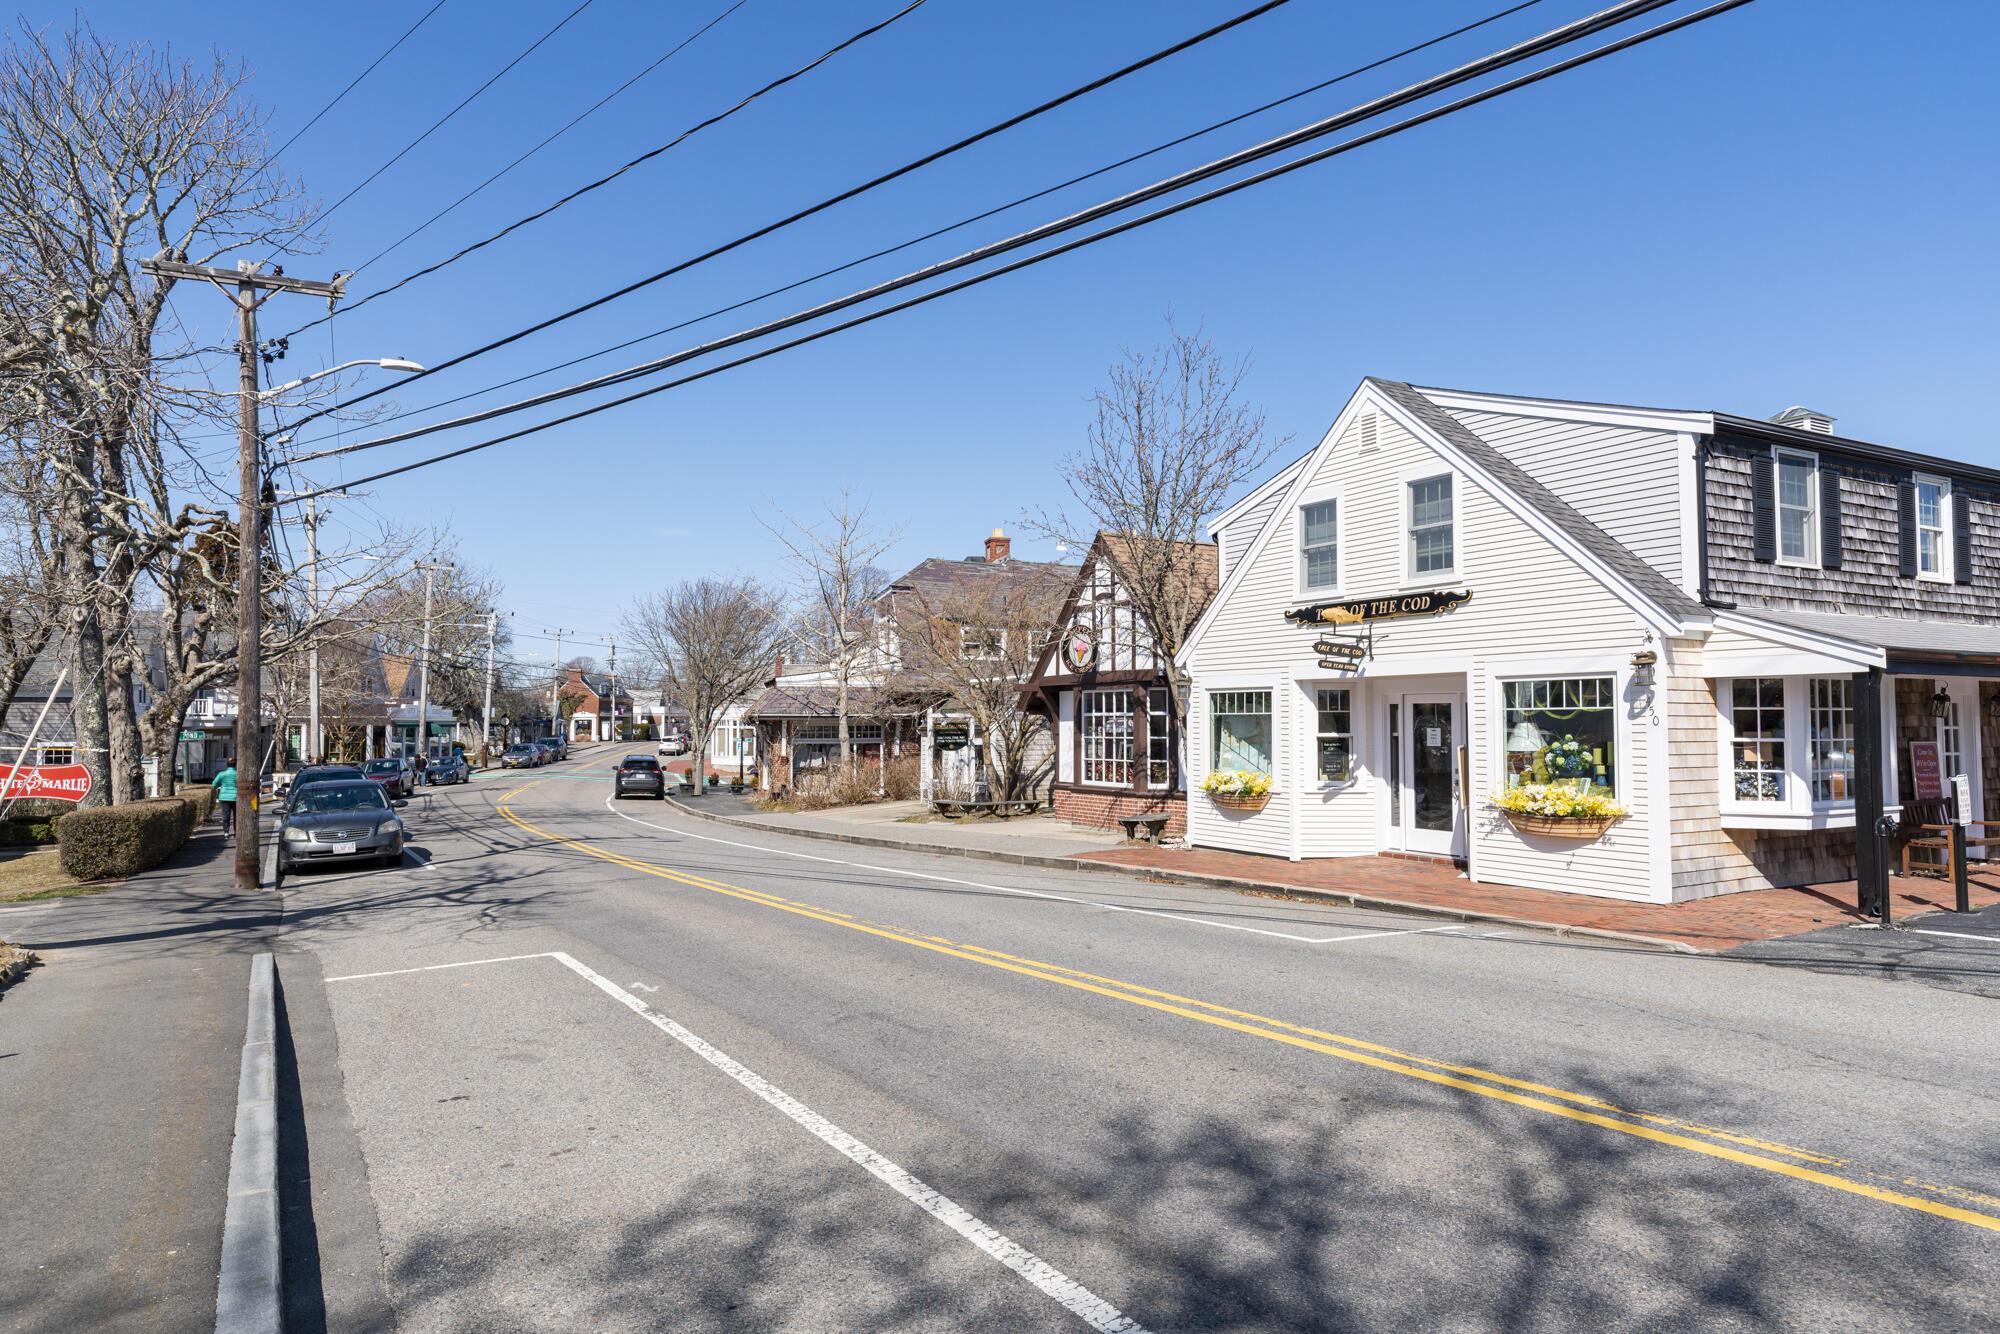 456 Main Street, Chatham, MA  02633 - slide 15